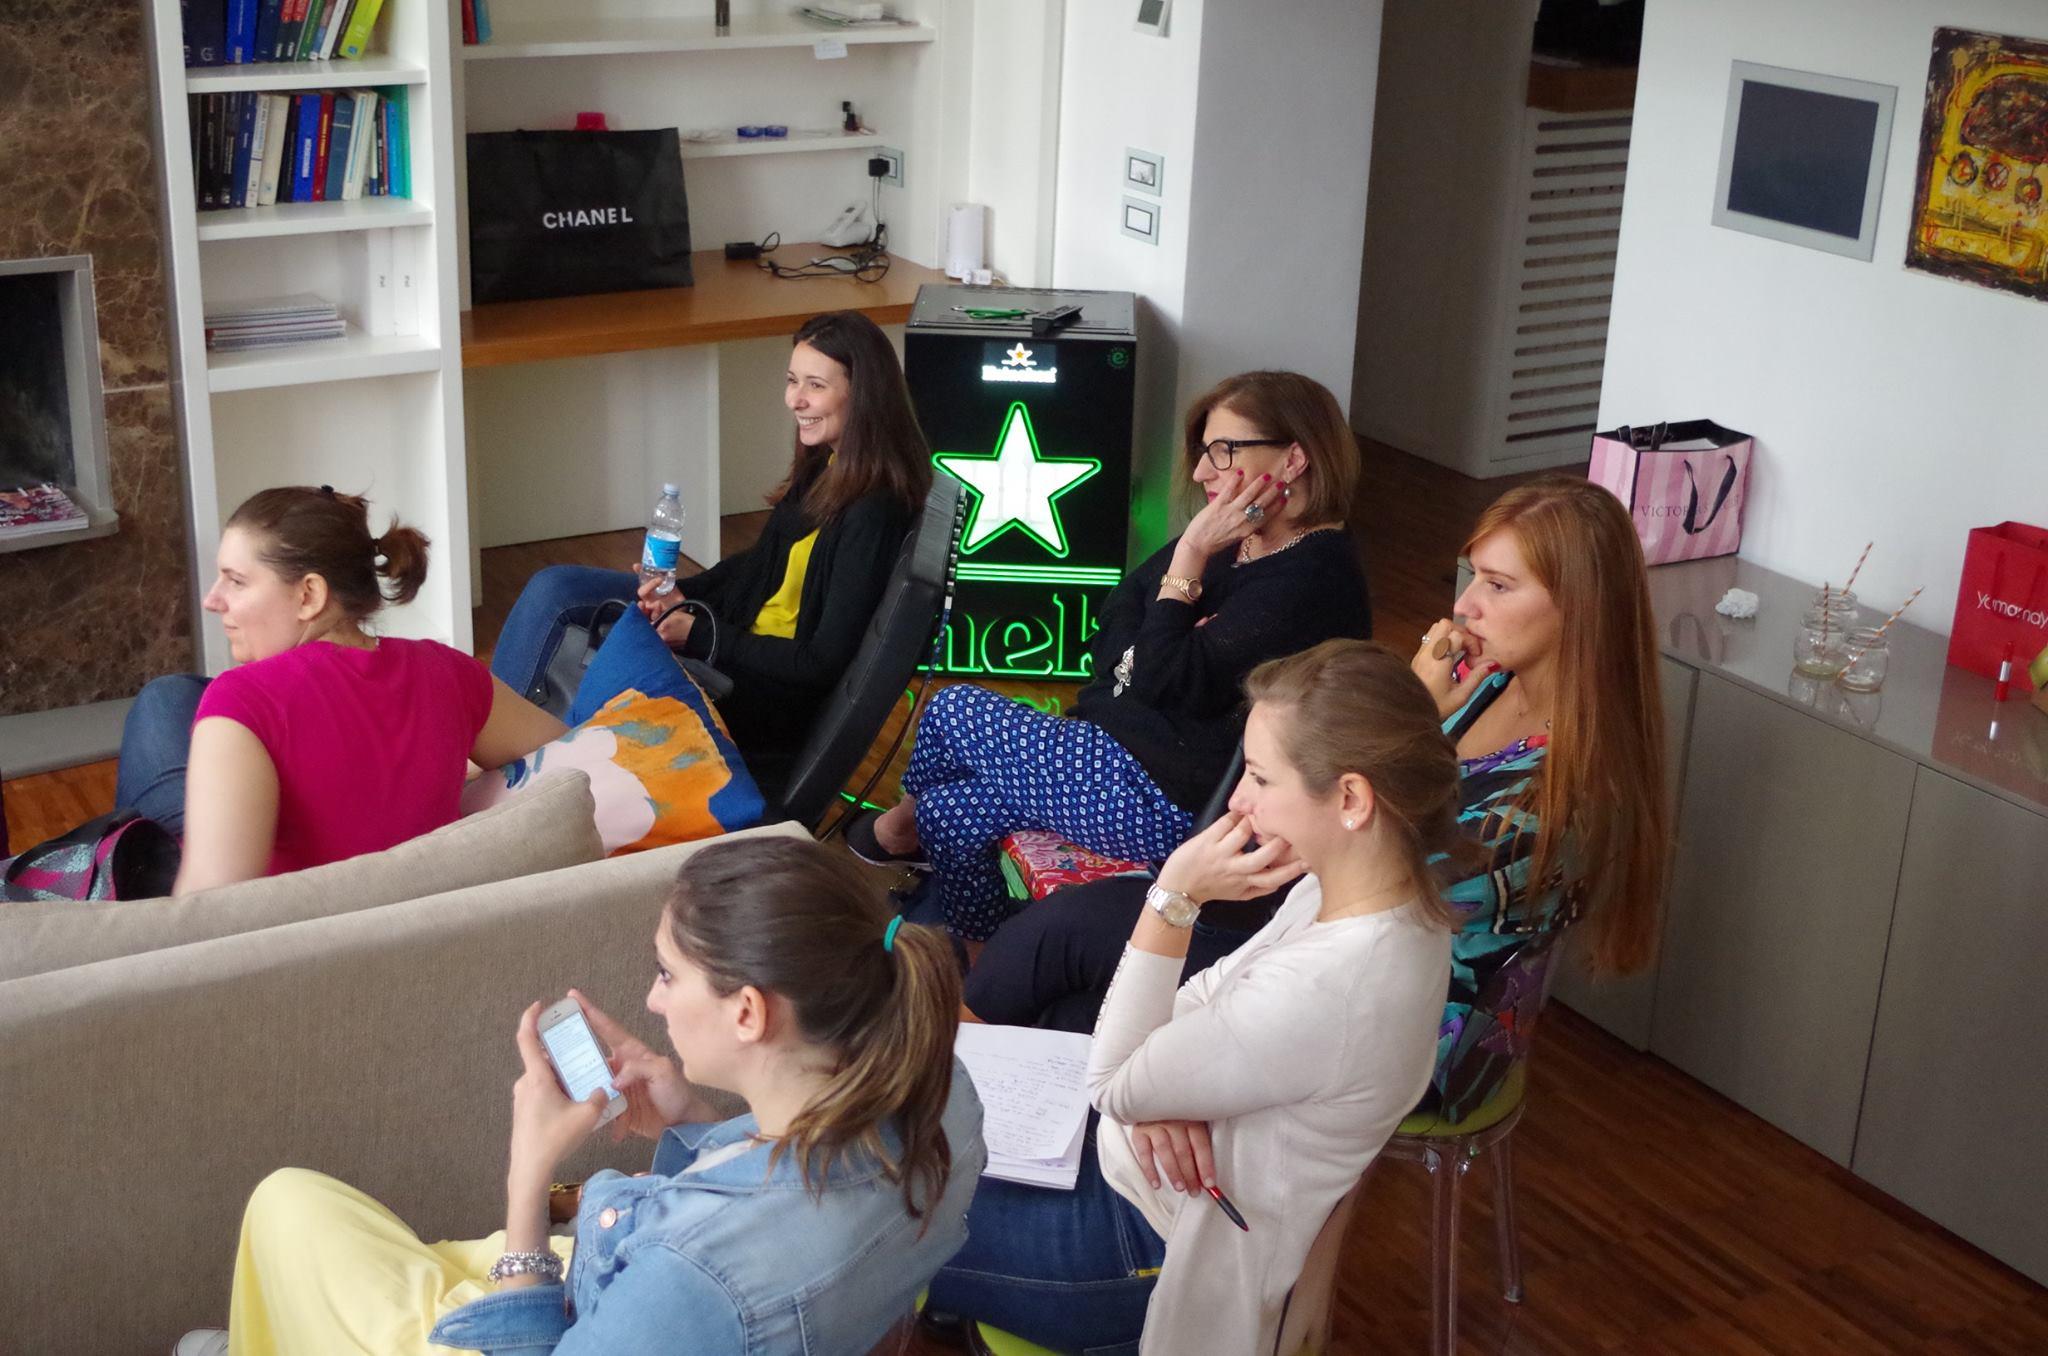 Workshop-Girls-Love-Instagram-Pinktrotters-Loft-Milano-4